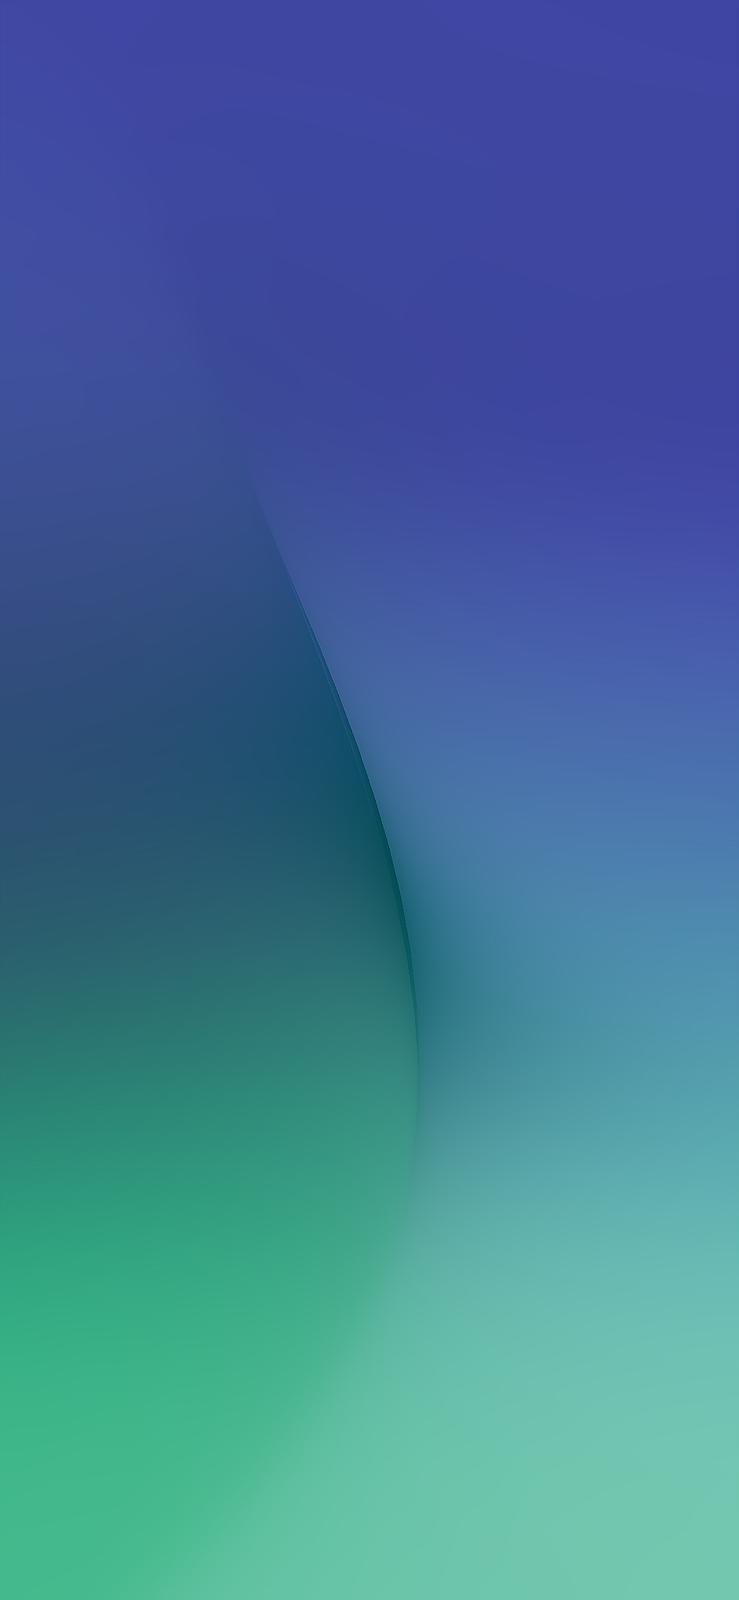 Aqua Fluid By Ar72014 Iphone X Xs Xsmax Xr Wallpaper Iphone Android Hd Wallpaper Android Abstract Wallpaper Backgrounds Apple Wallpaper